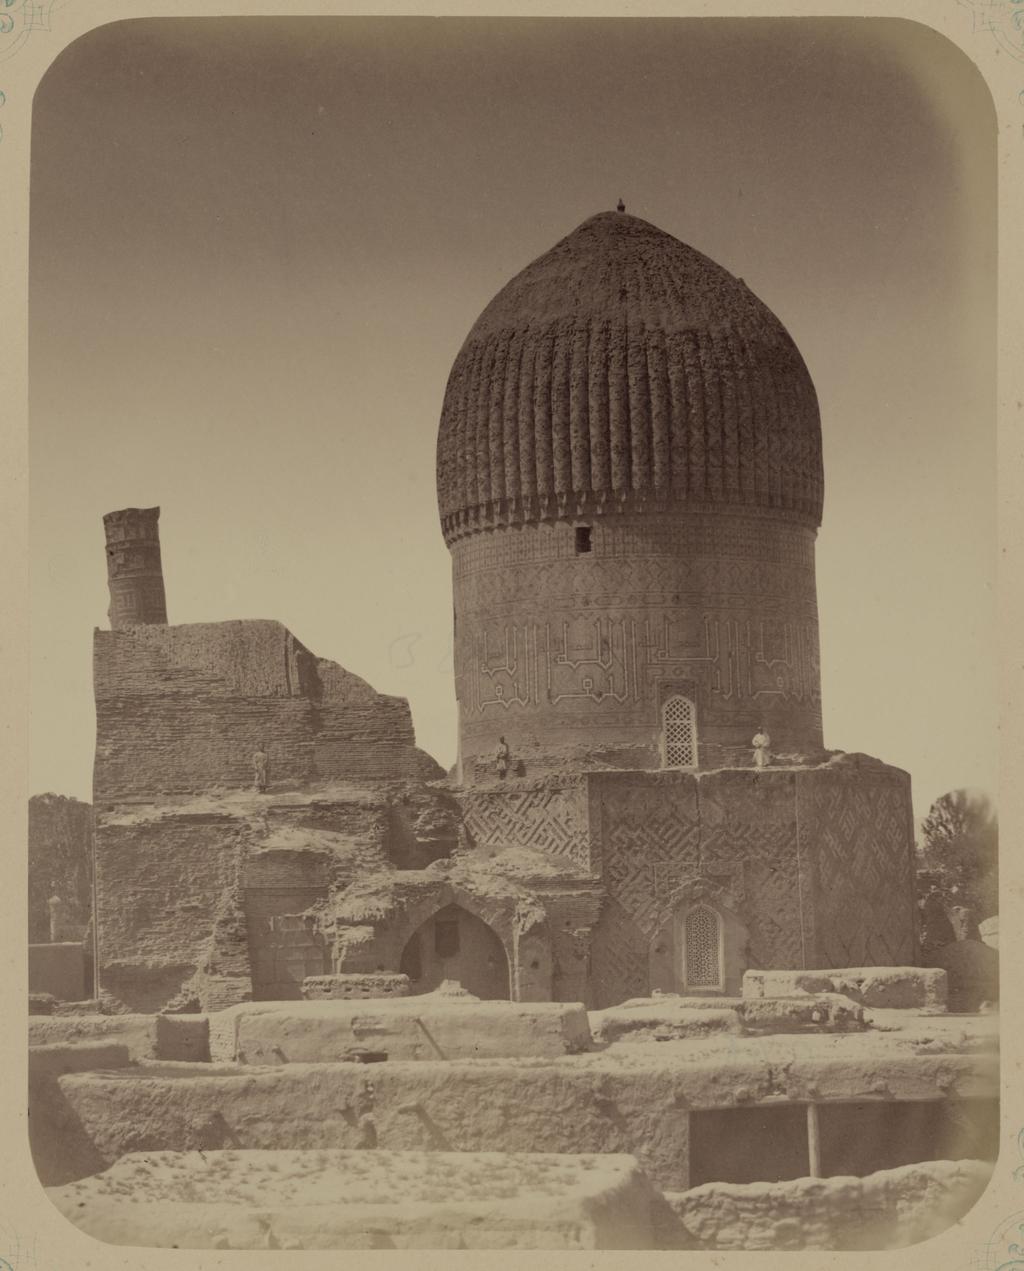 Мавзолей эмира Тимура Курагана. Вид южного фасада мавзолея